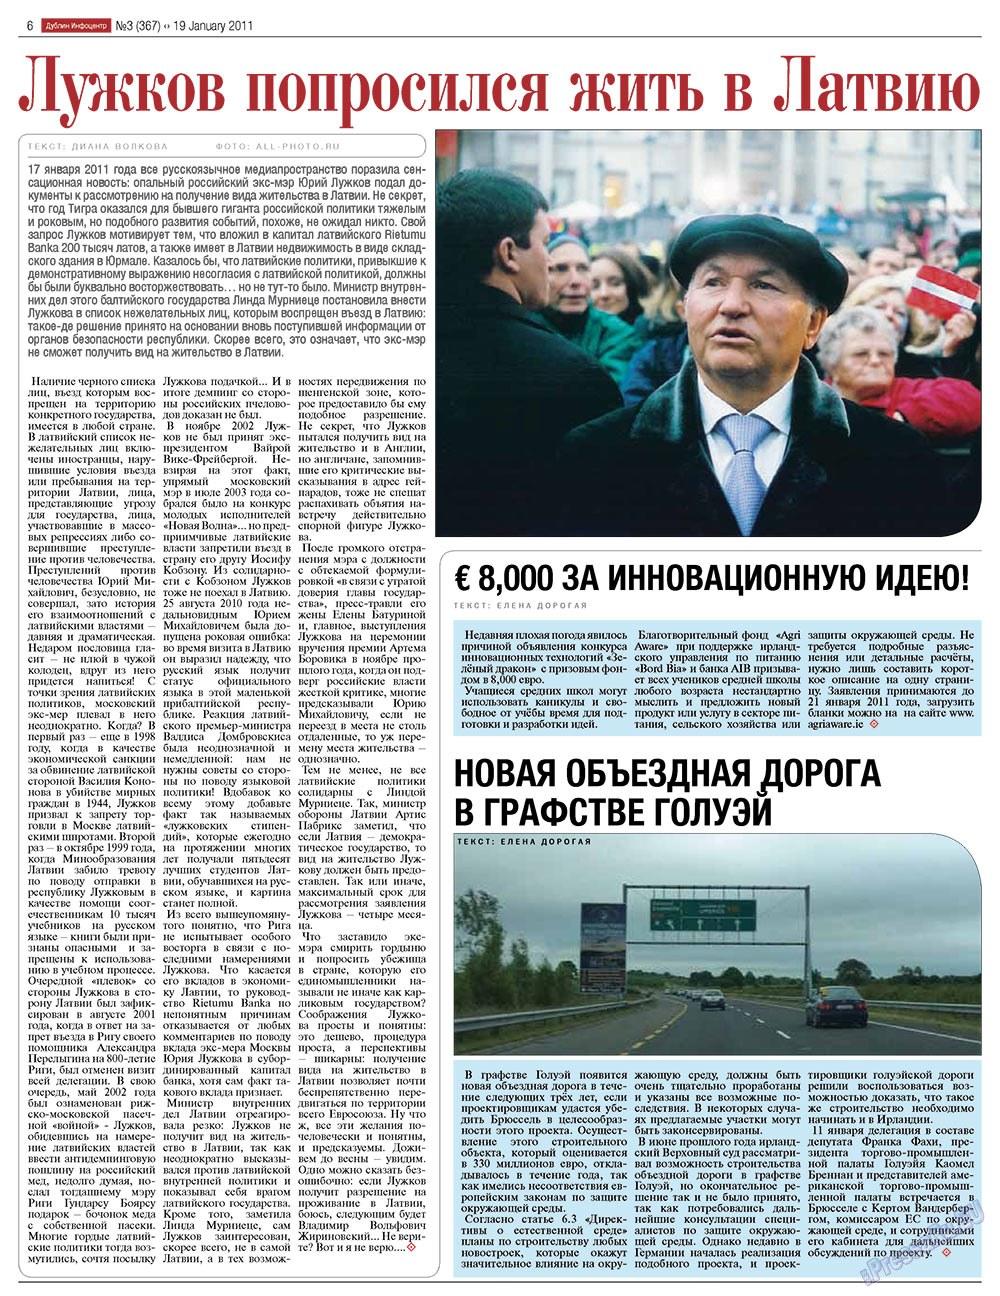 Дублин инфоцентр (газета). 2011 год, номер 3, стр. 6